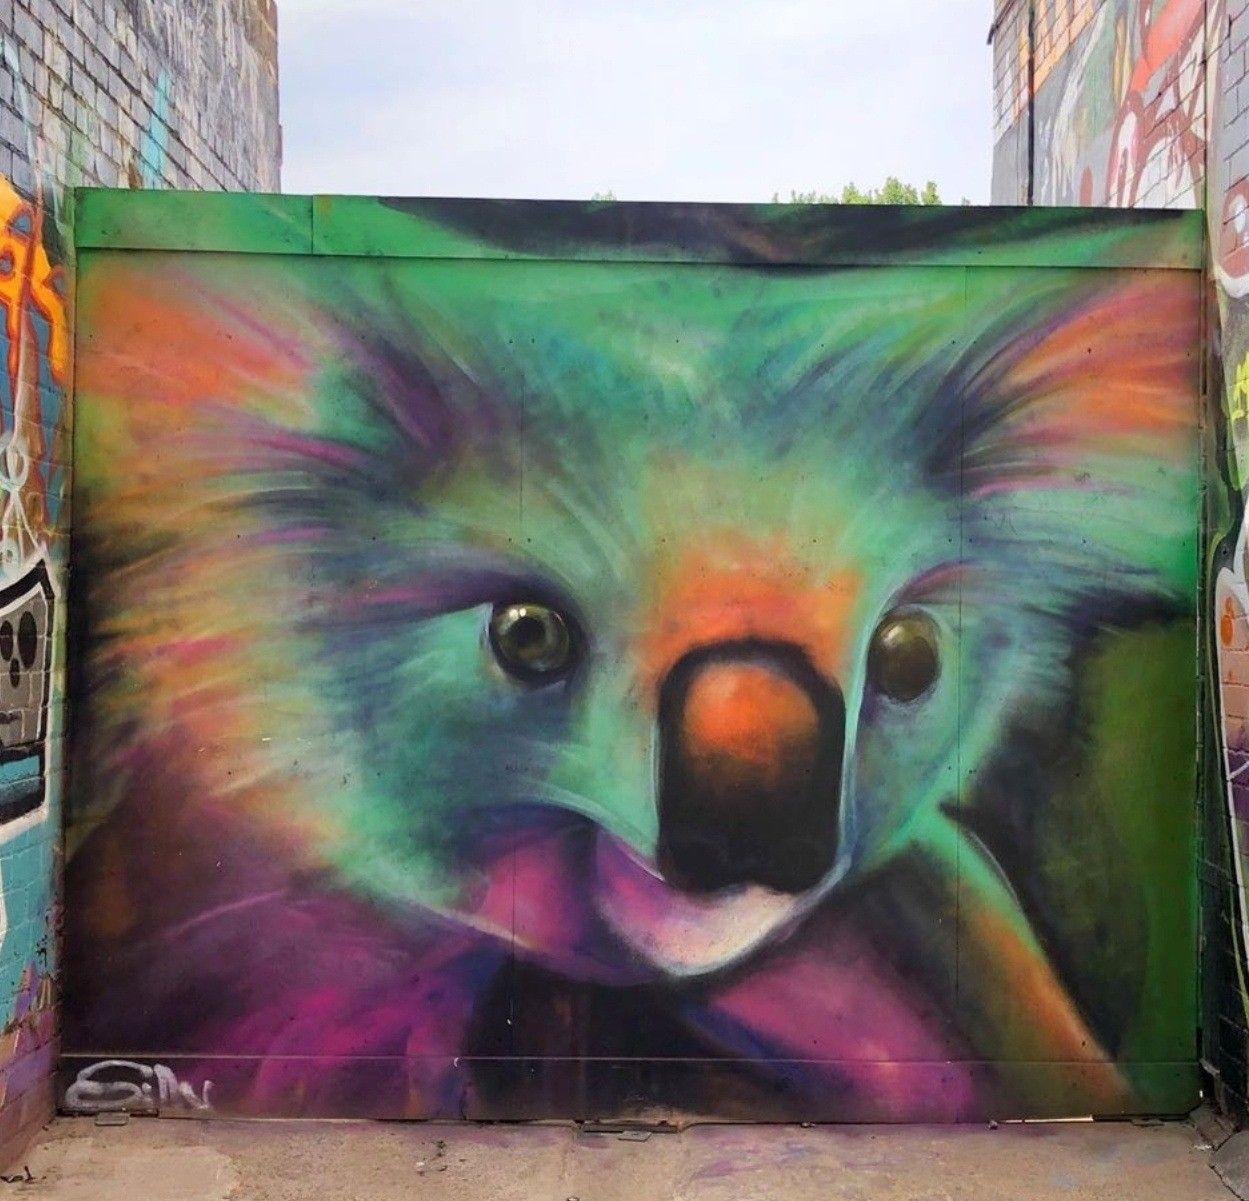 Silly Sully In 2020 Murals Street Art Street Art Urban Art Graffiti